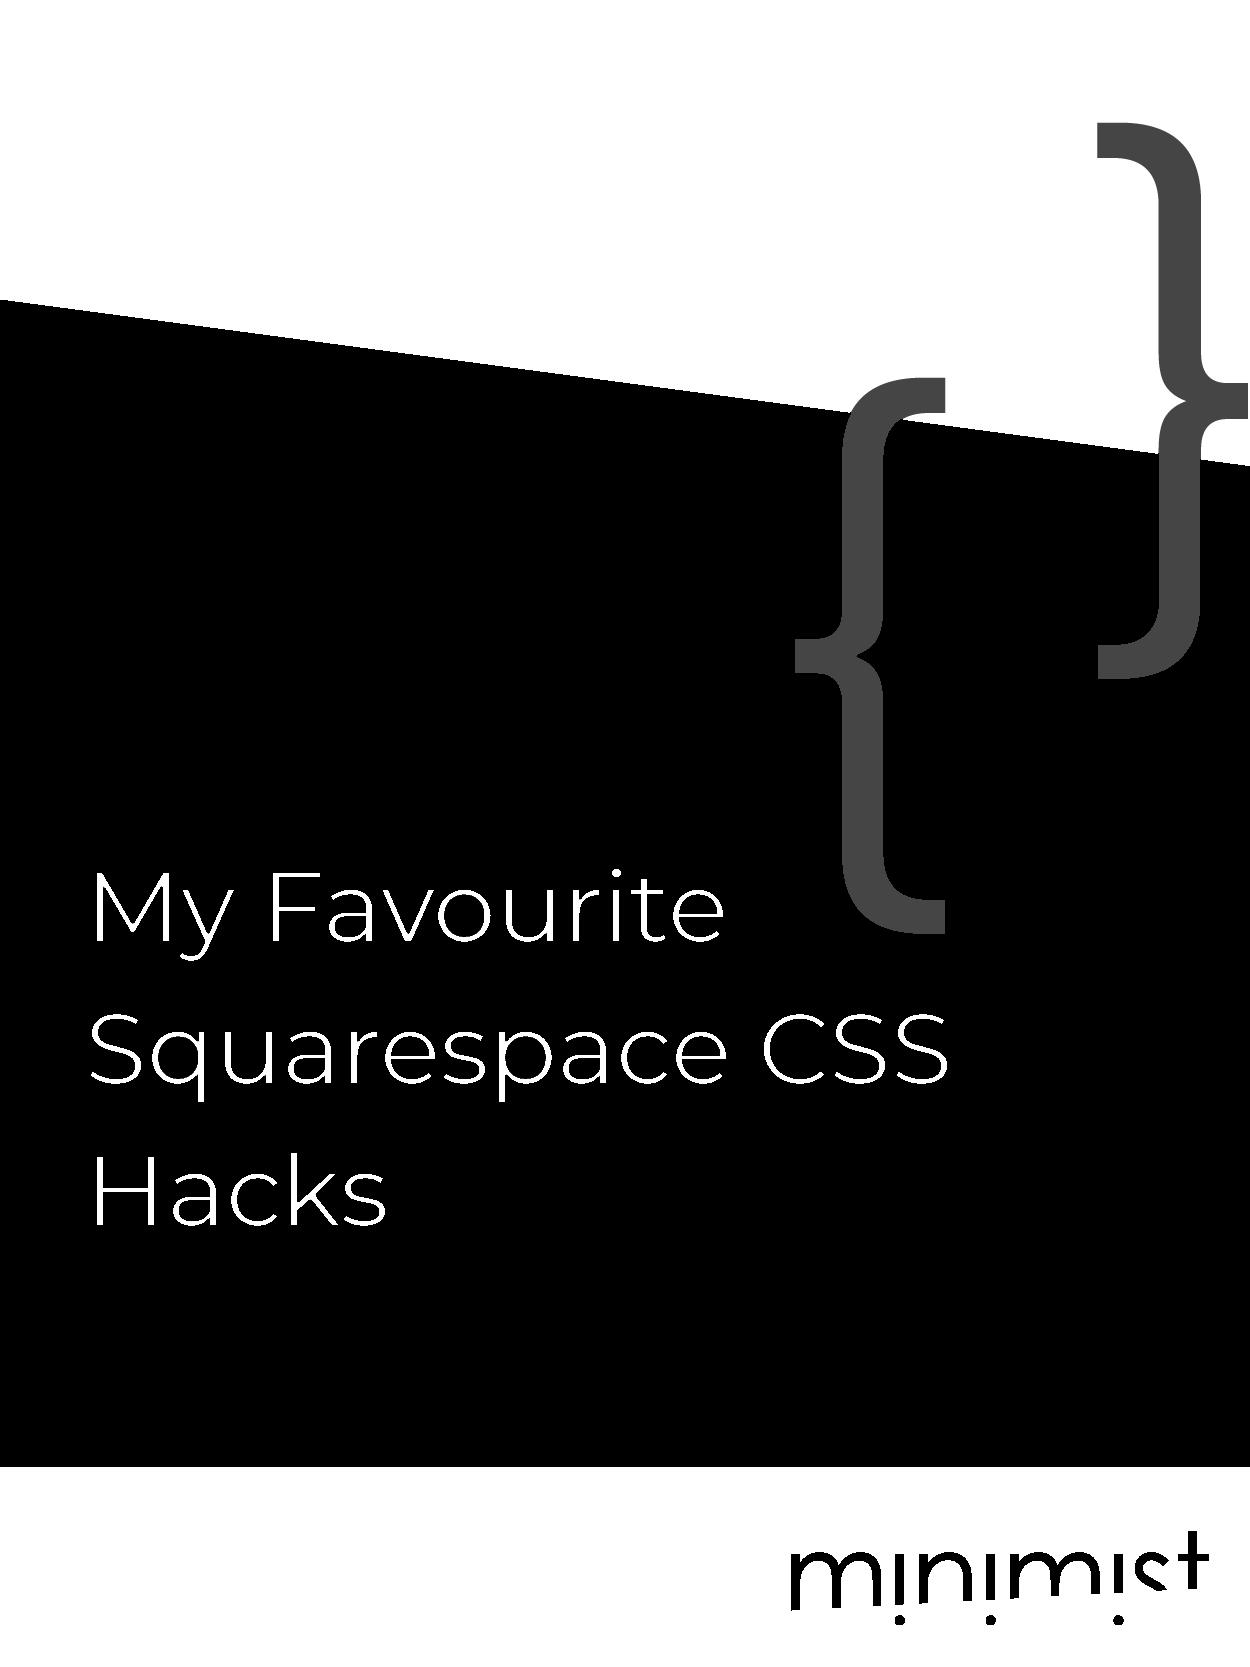 My Favourite Squarespace CSS Hacks